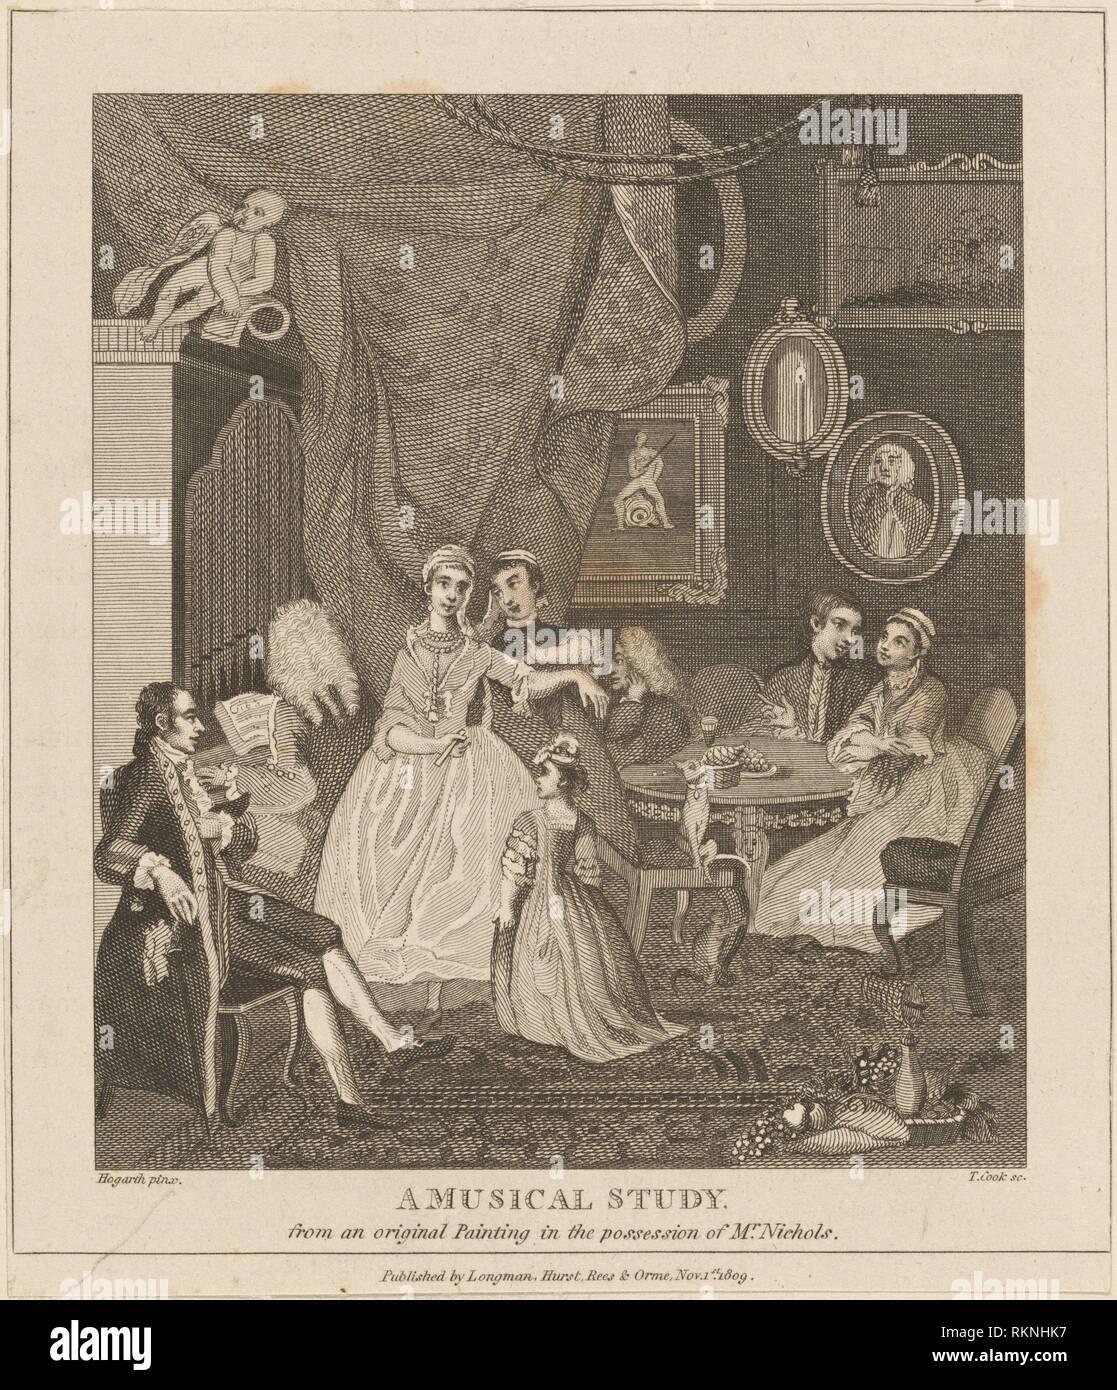 A Musical Study. Hogarth, William, 1697-1764 (Printmaker). William Hogarth: prints. Date Created: 1809. Prints. Still image. - Stock Image